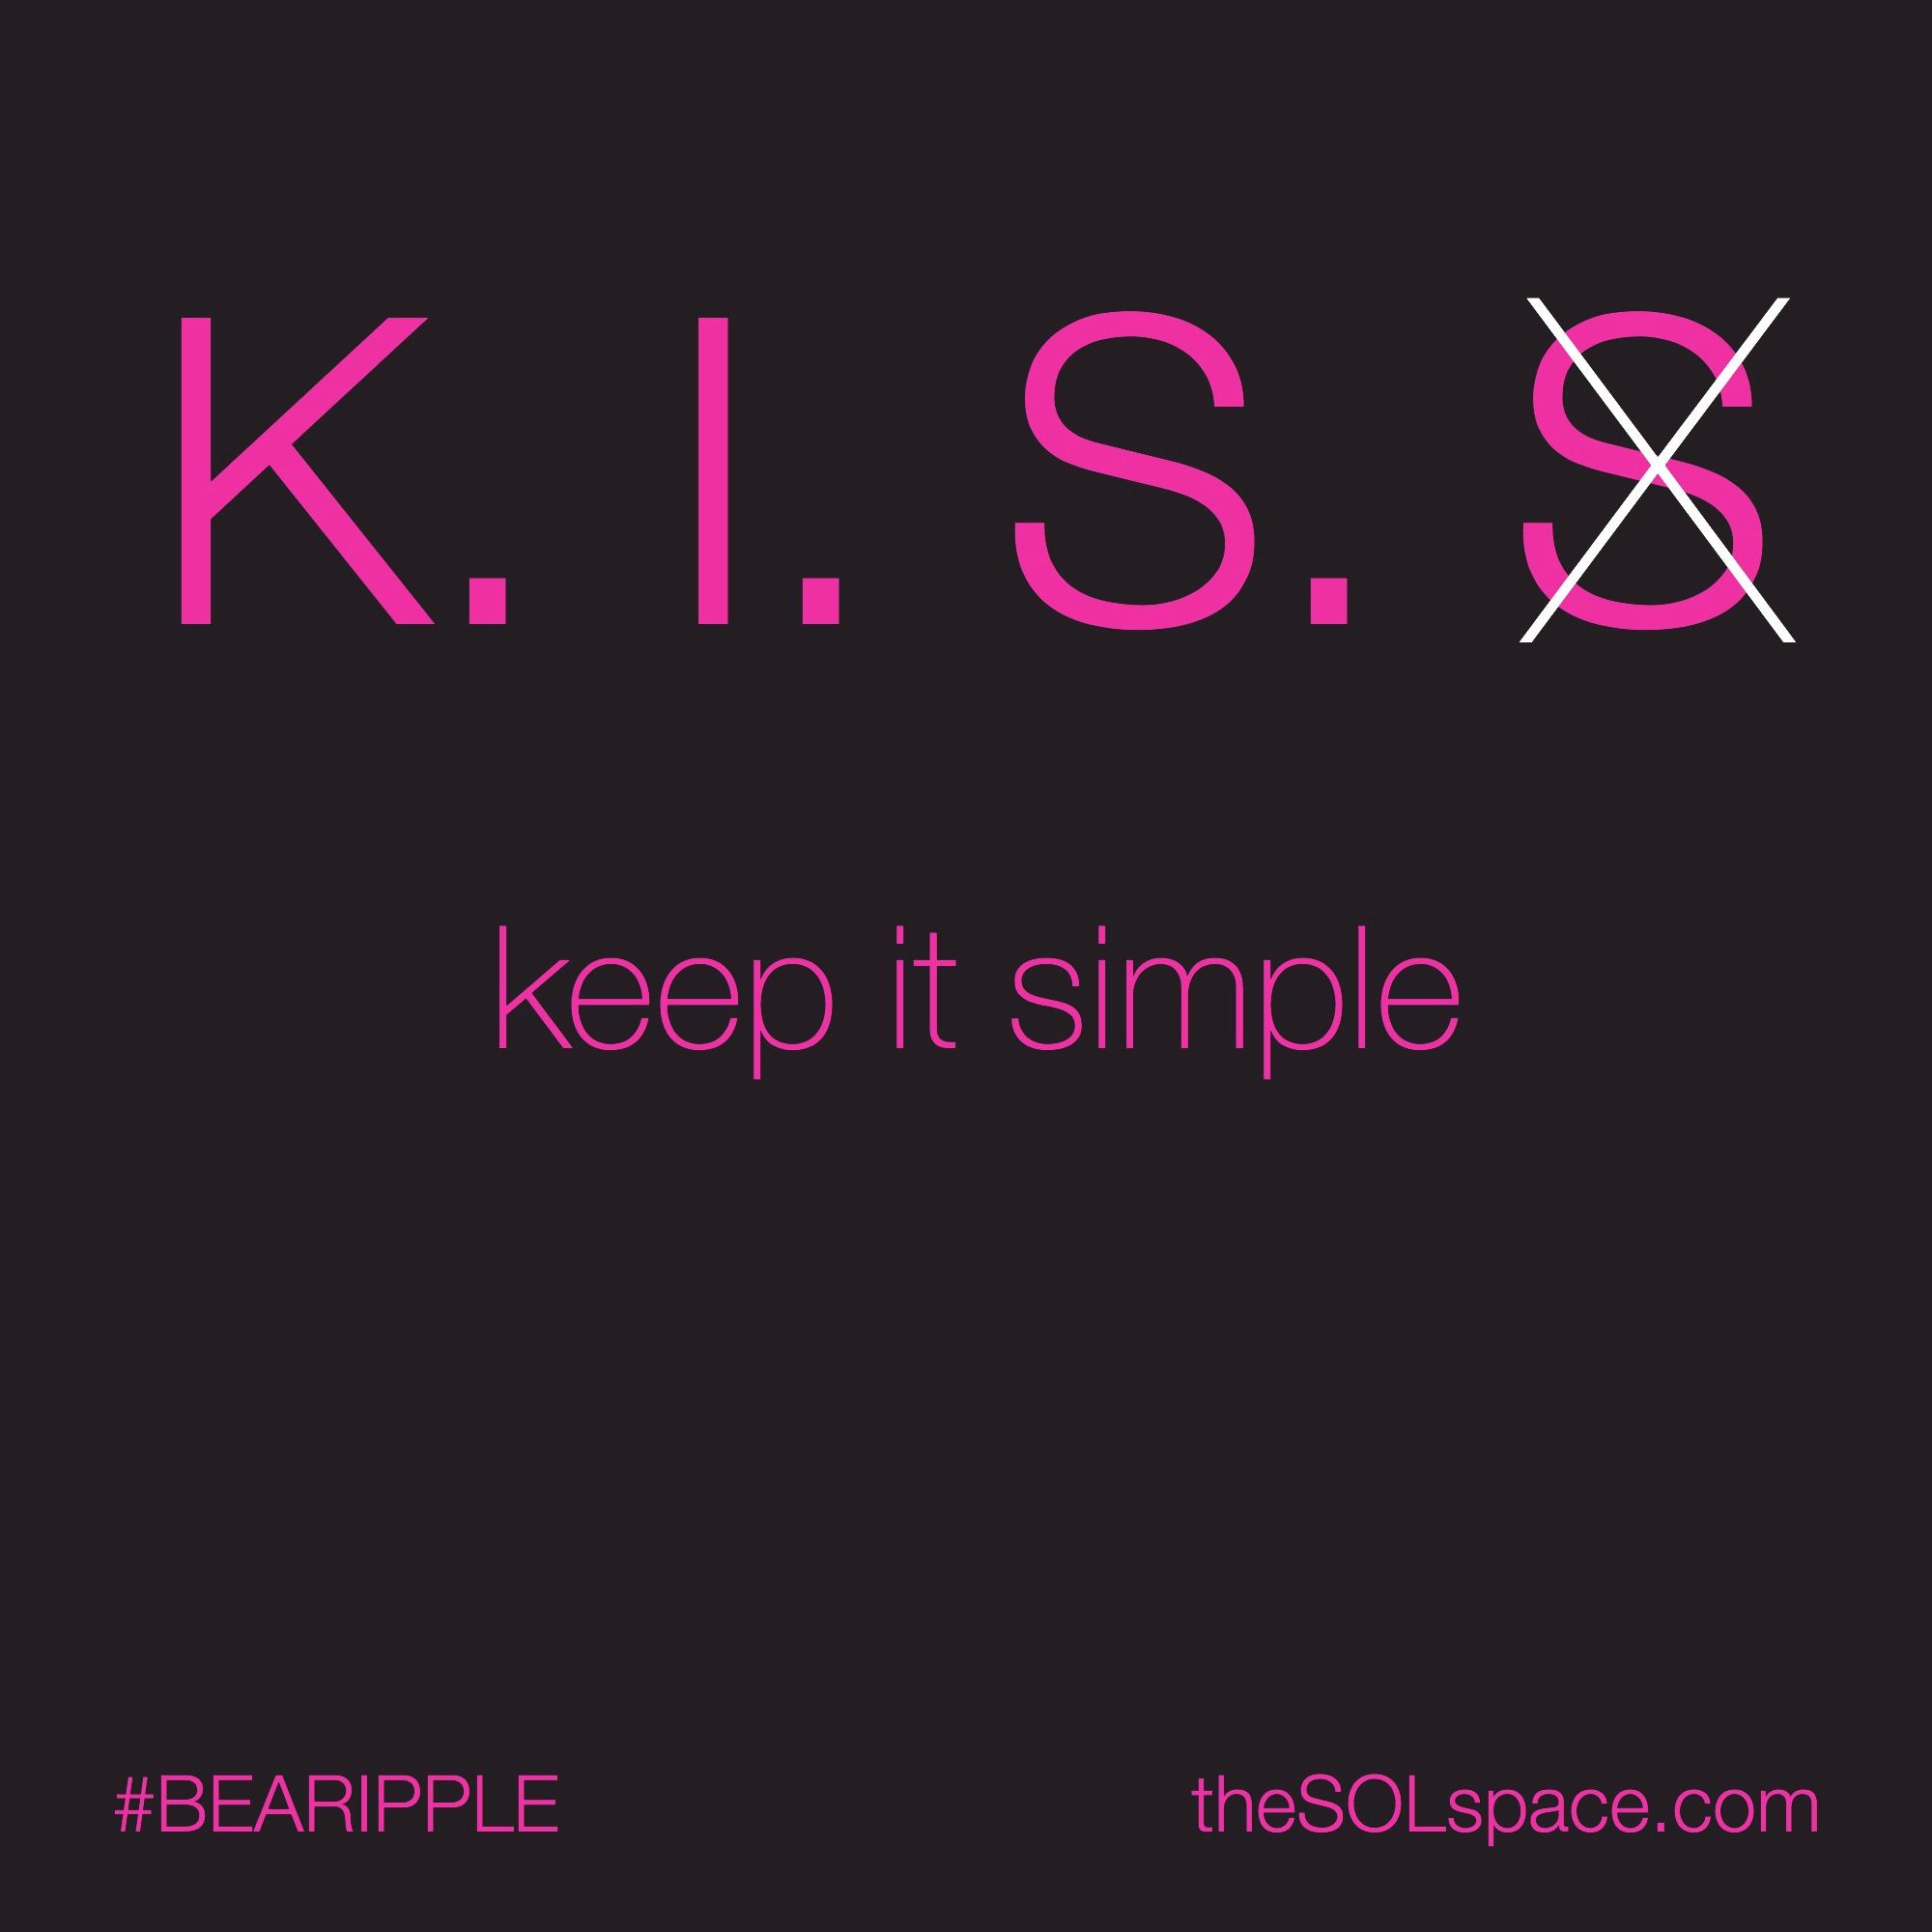 #BeARipple.. K.I.S.S. keep it simple @theSOLspace